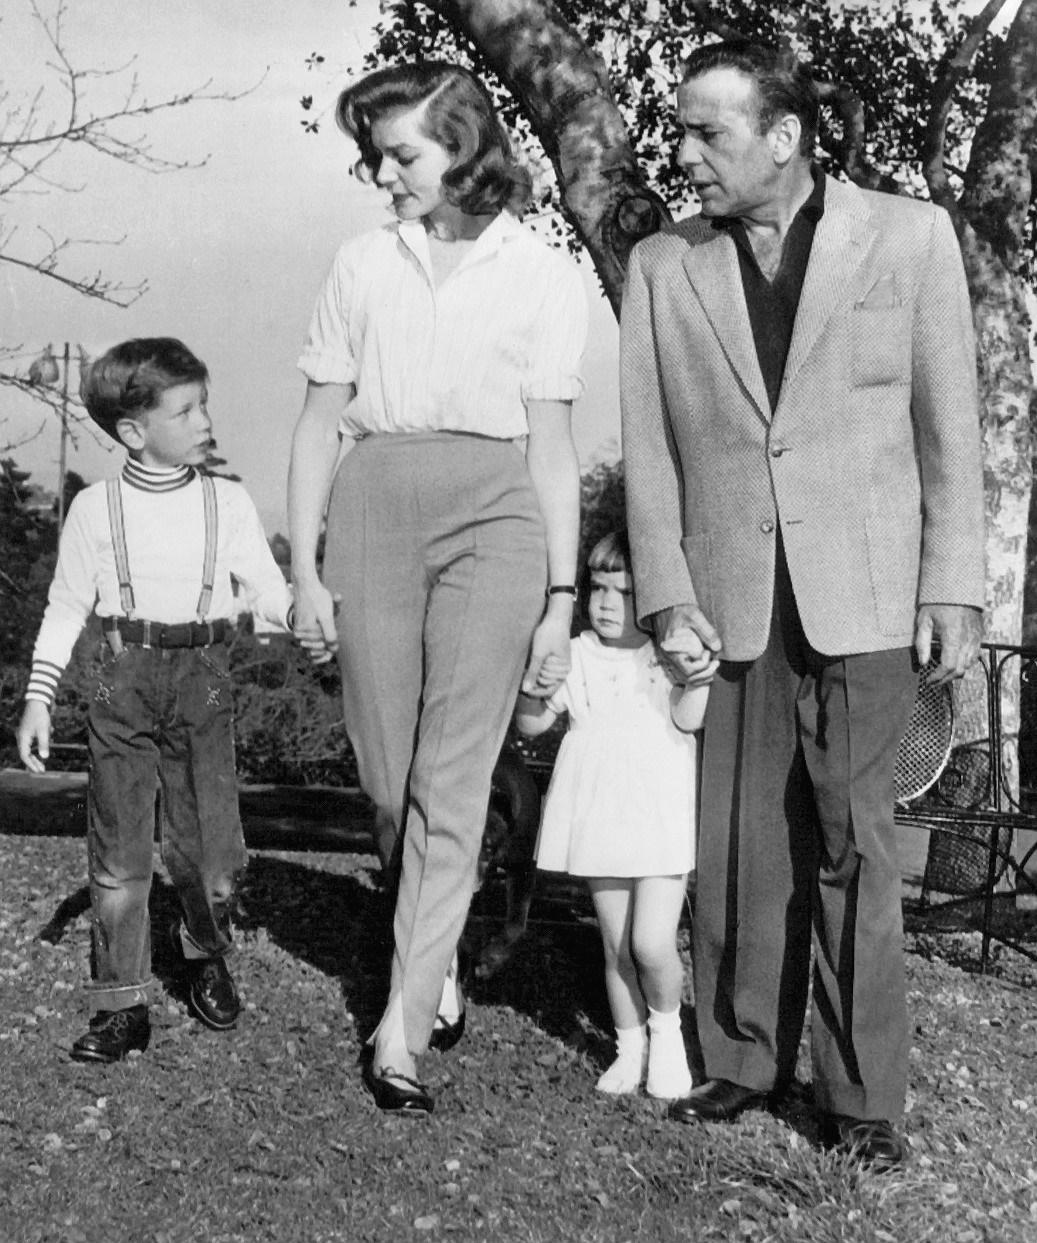 Stephen Humphrey Bogart Wikipedia